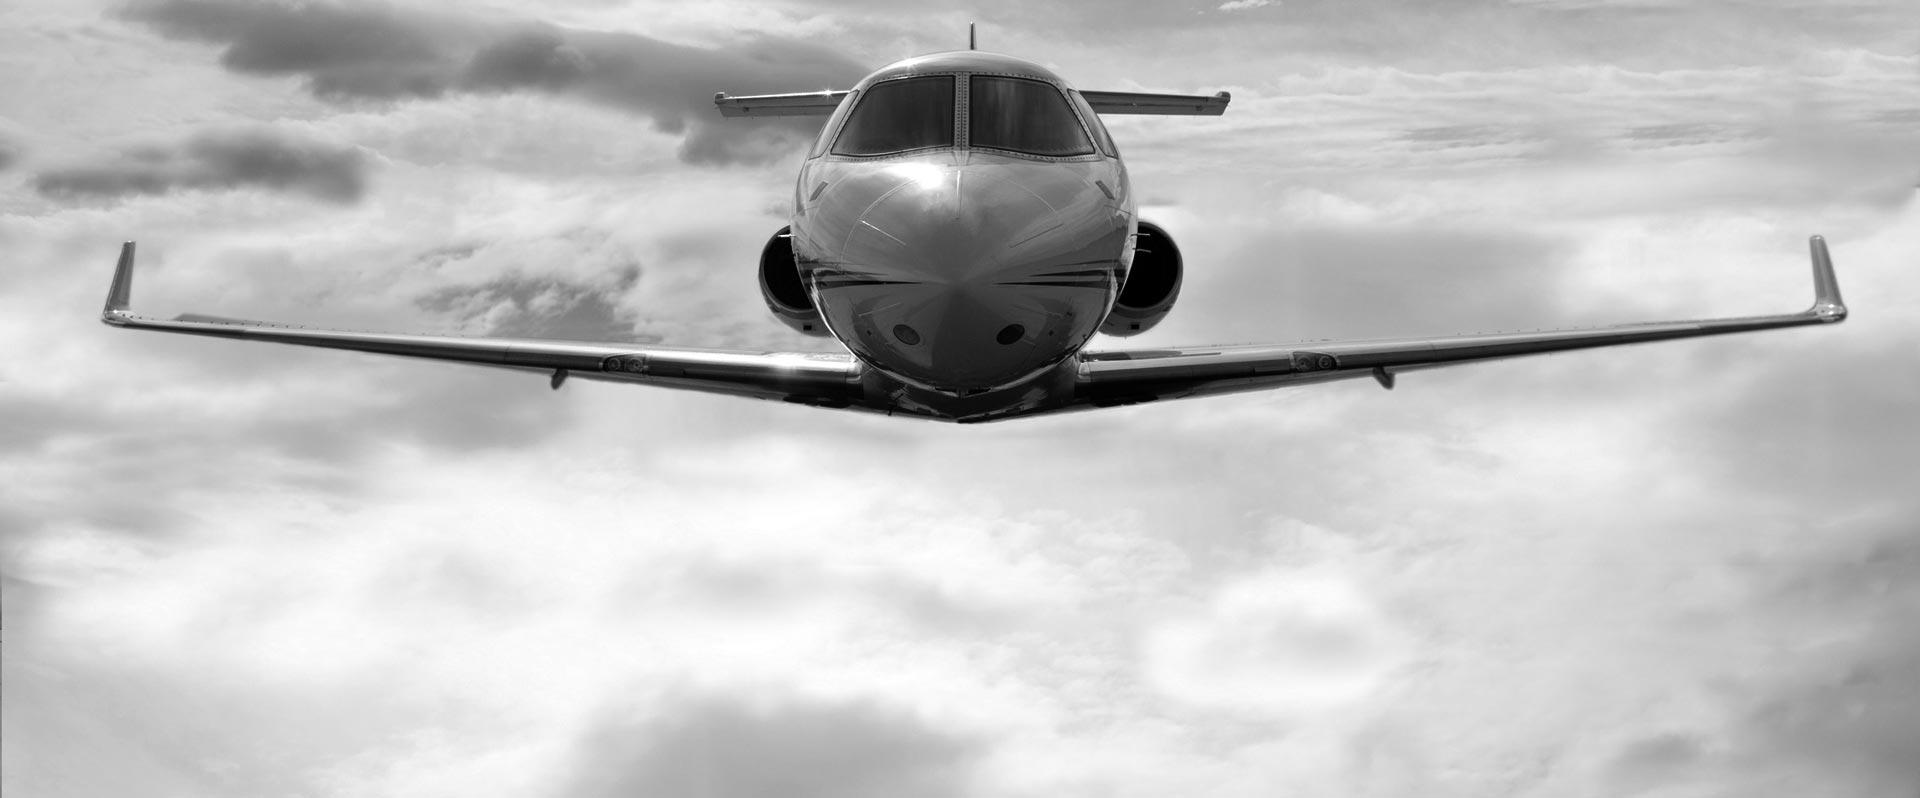 Location jet privé : un vol last minute à prix mini